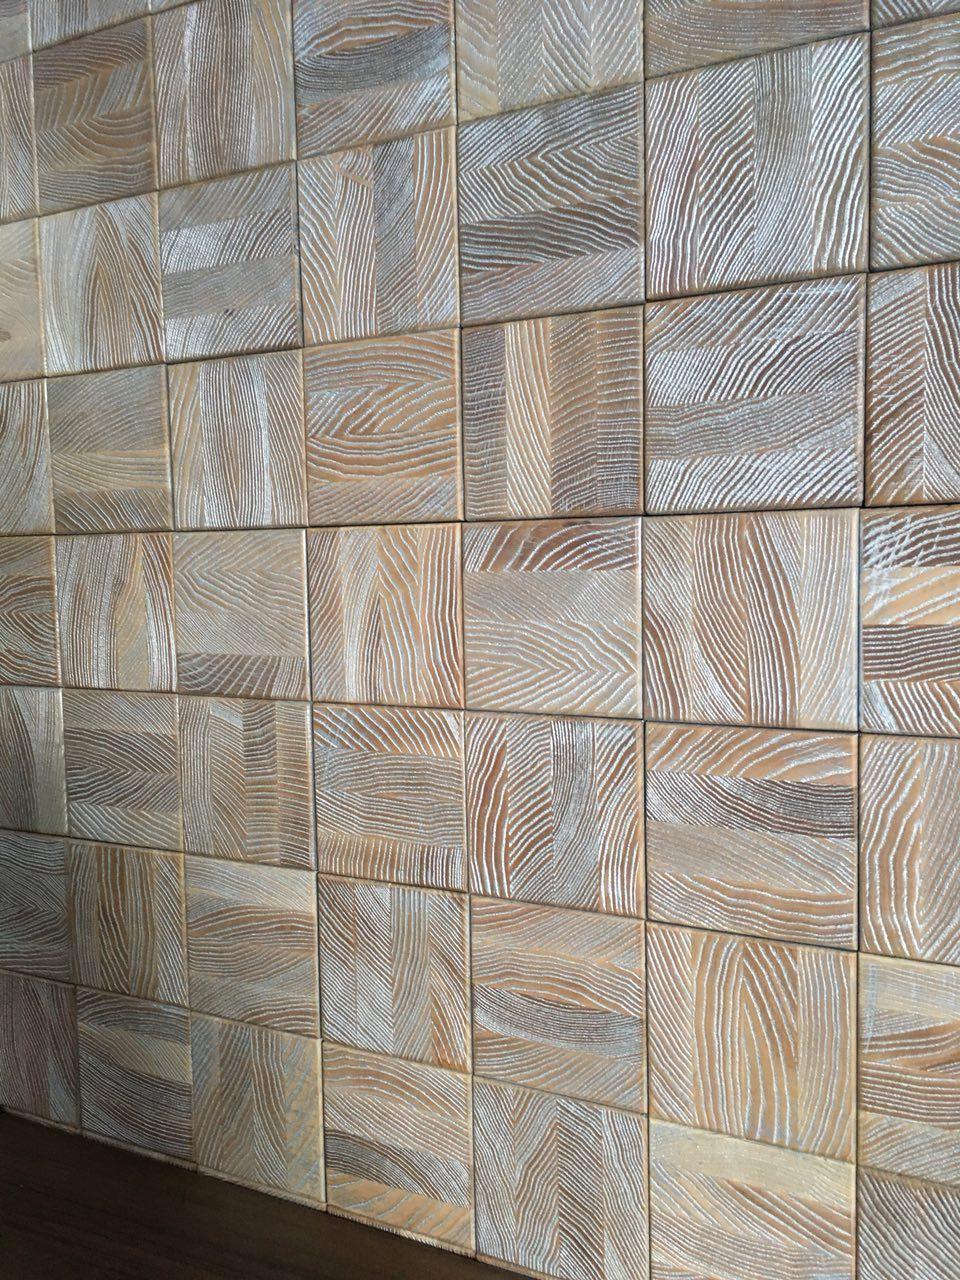 Wooden Panels Mosaic Patina Panels Yourforest Yourforestpanels Woodenpanels Woodendecor Mosaic Wooden Wall Panels Wood Panel Walls Interior Wall Design